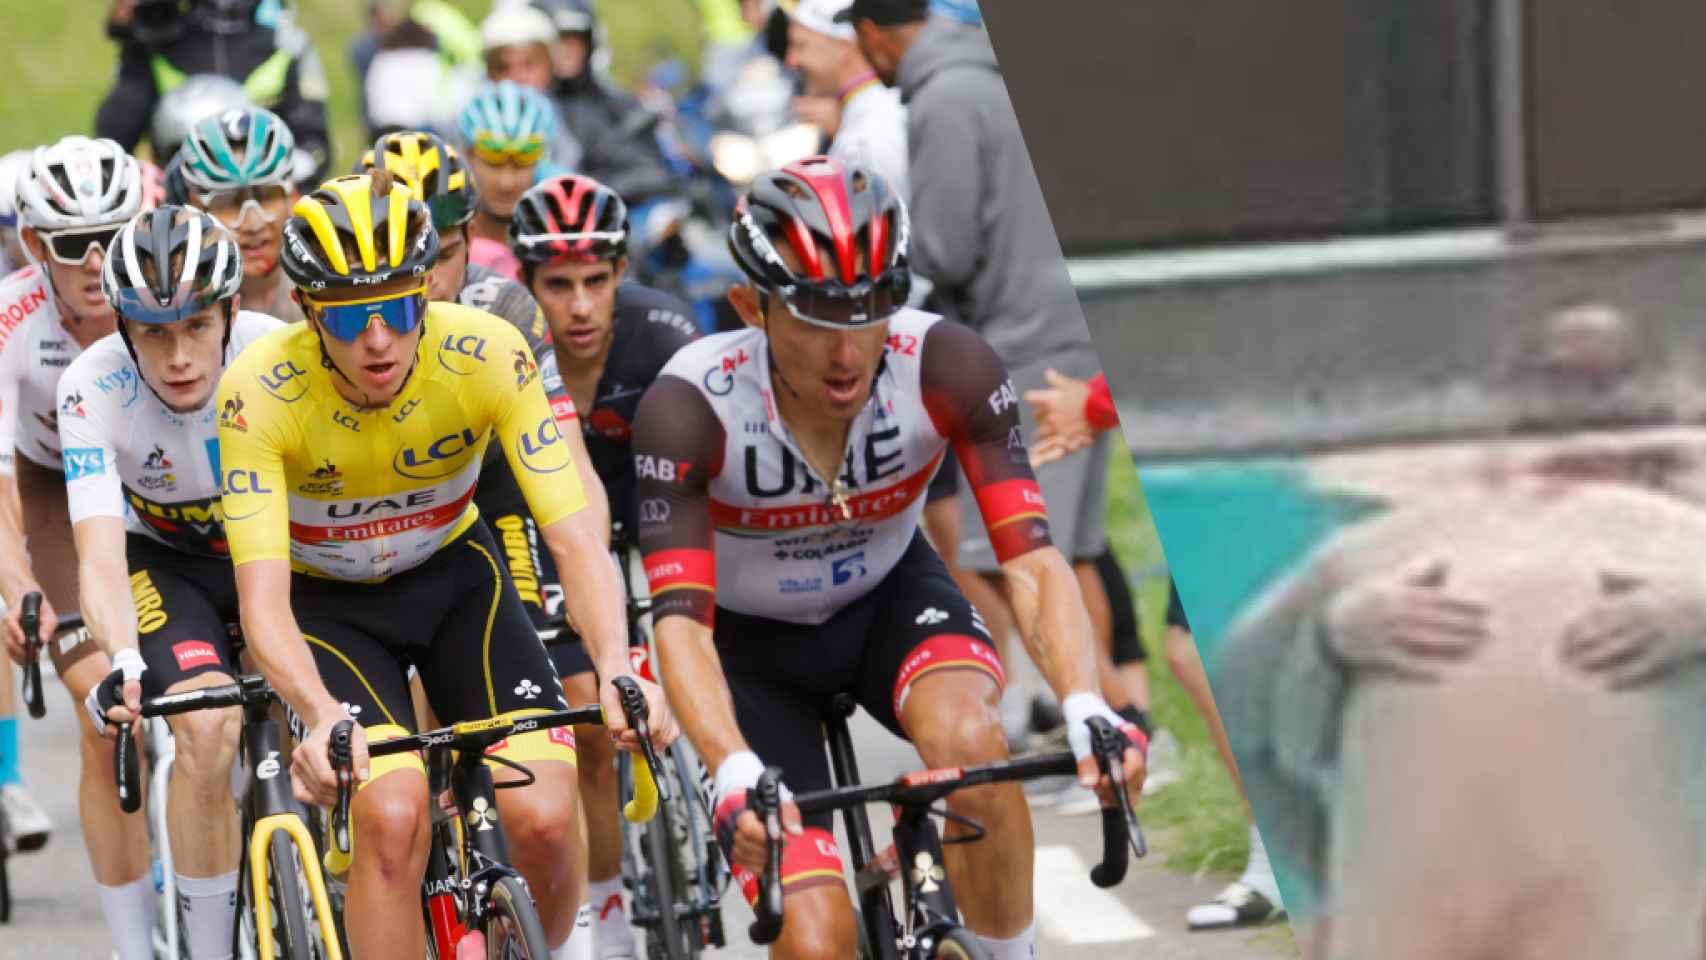 La escena íntima que se coló en el Tour de Francia